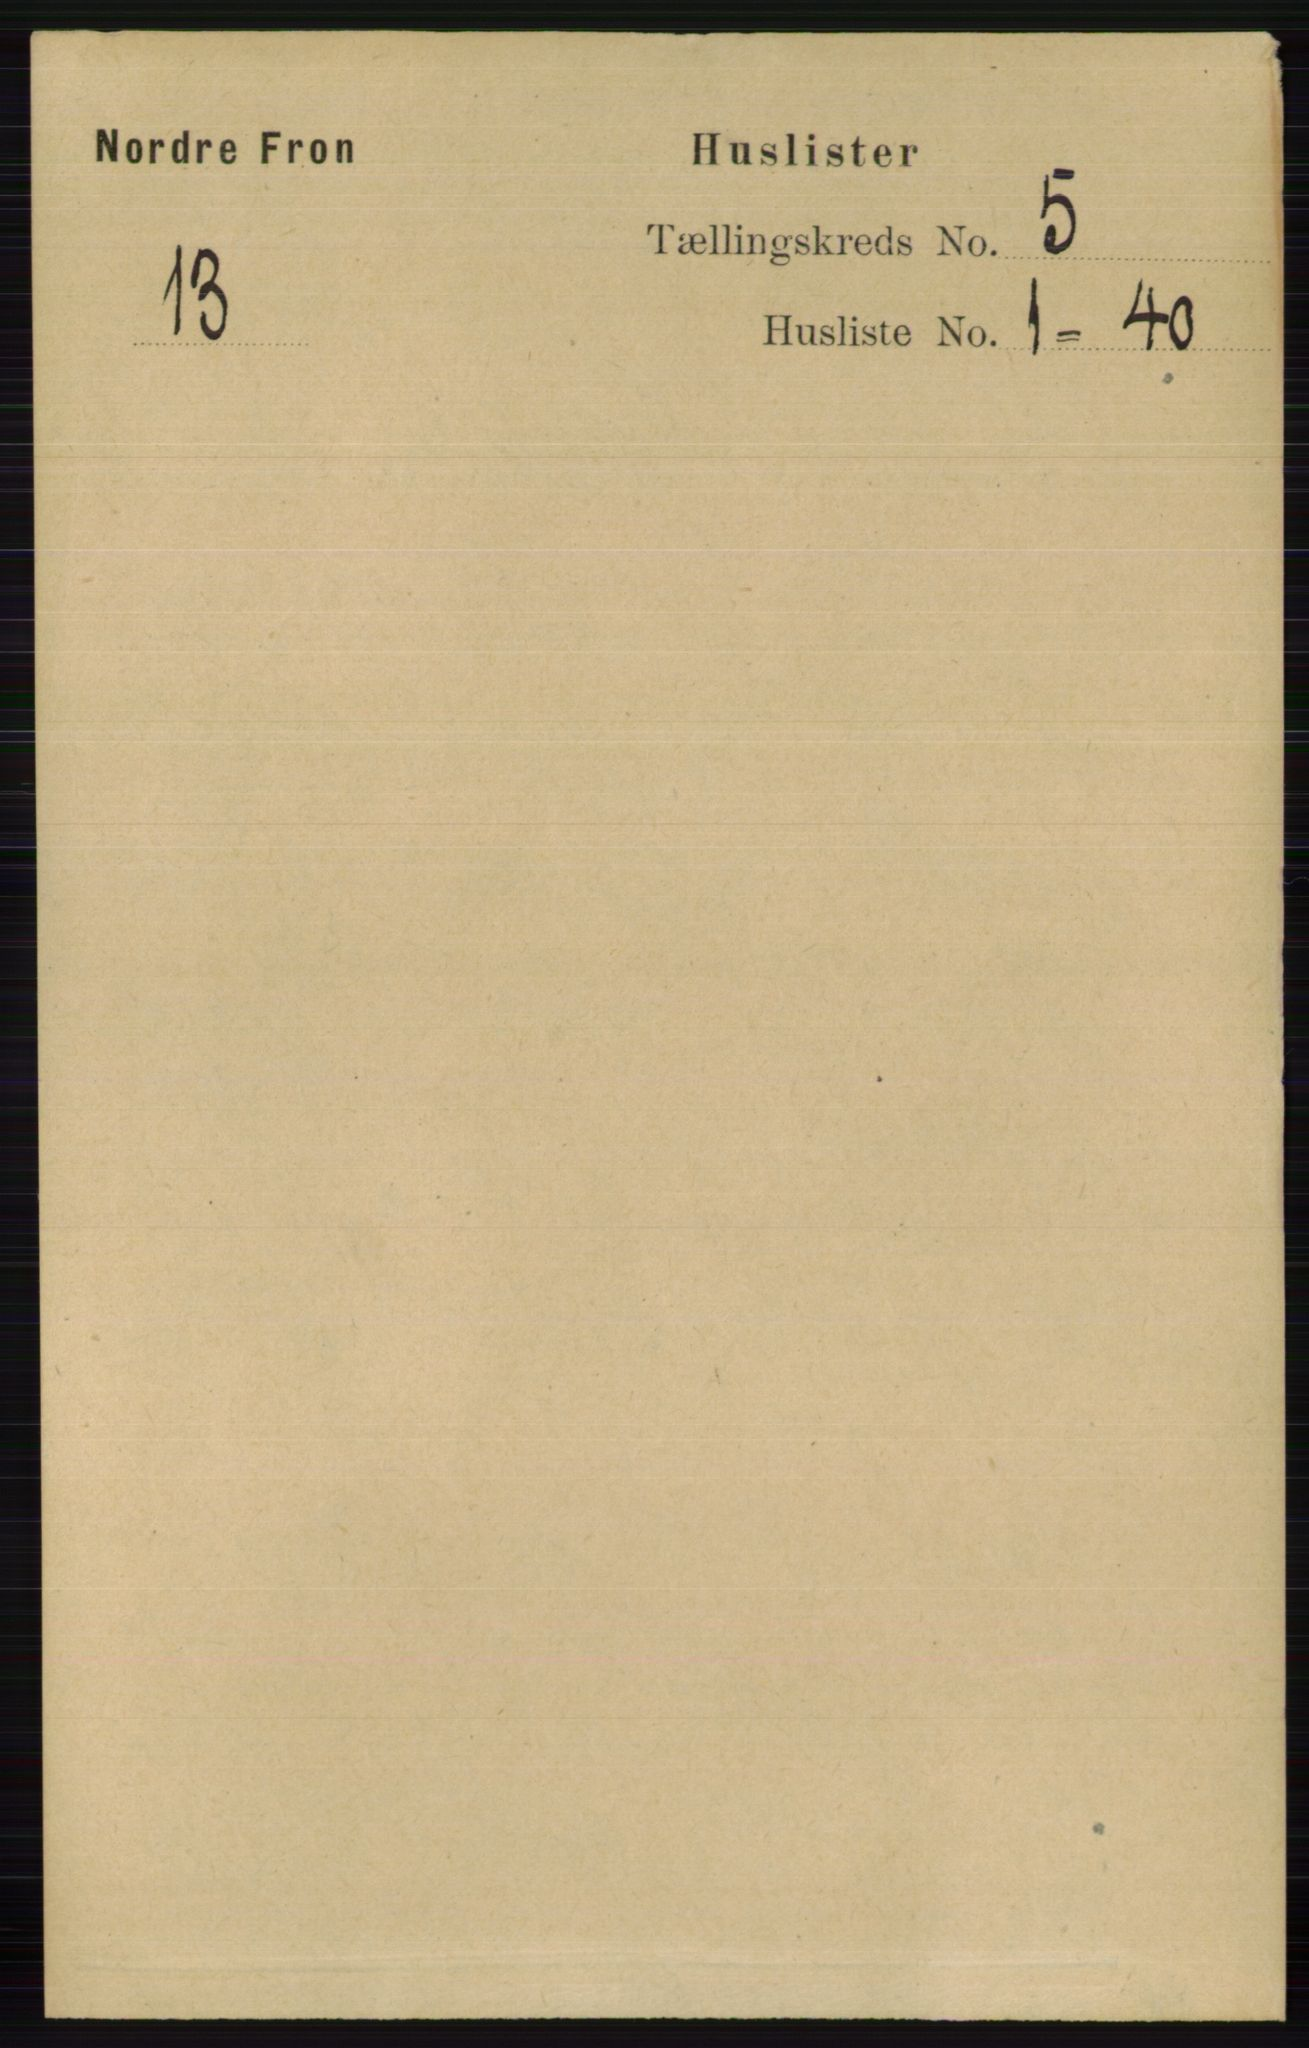 RA, Folketelling 1891 for 0518 Nord-Fron herred, 1891, s. 1921